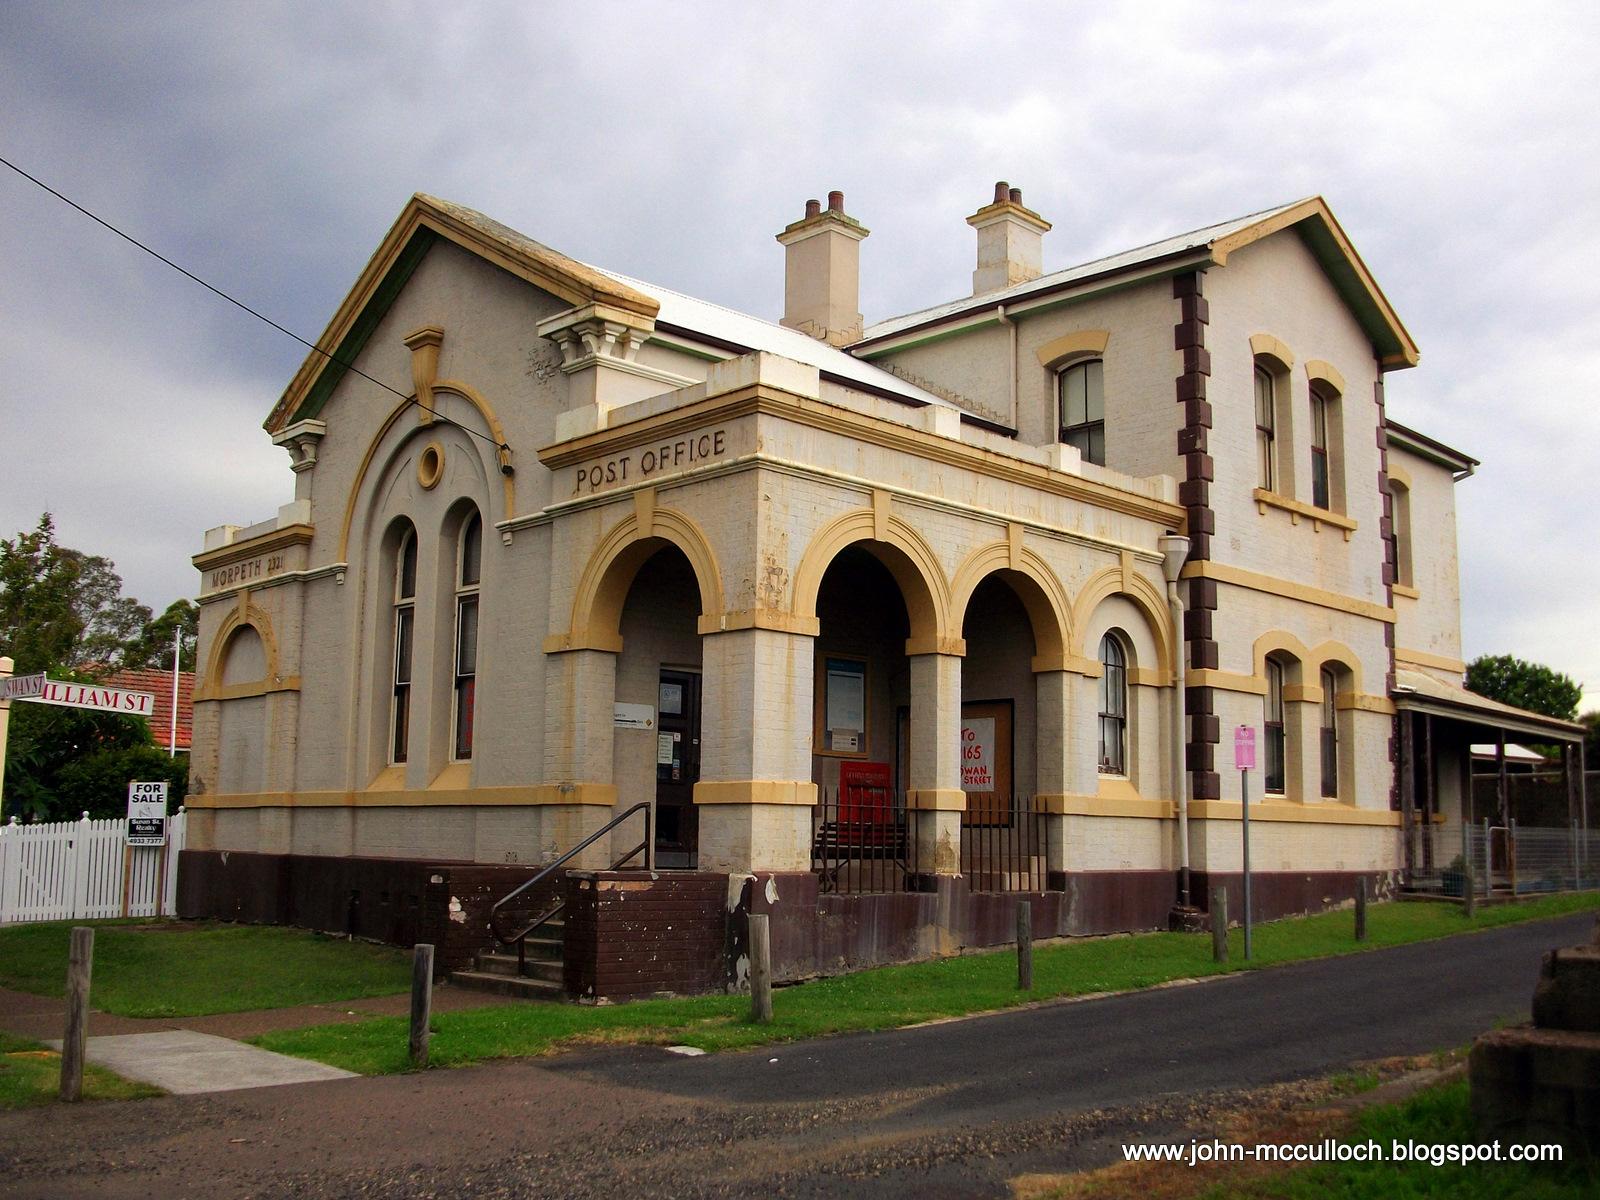 Morpeth Australia  city photos gallery : Thru My Lens: The Lost Post Offices of Australia Morpeth 2321